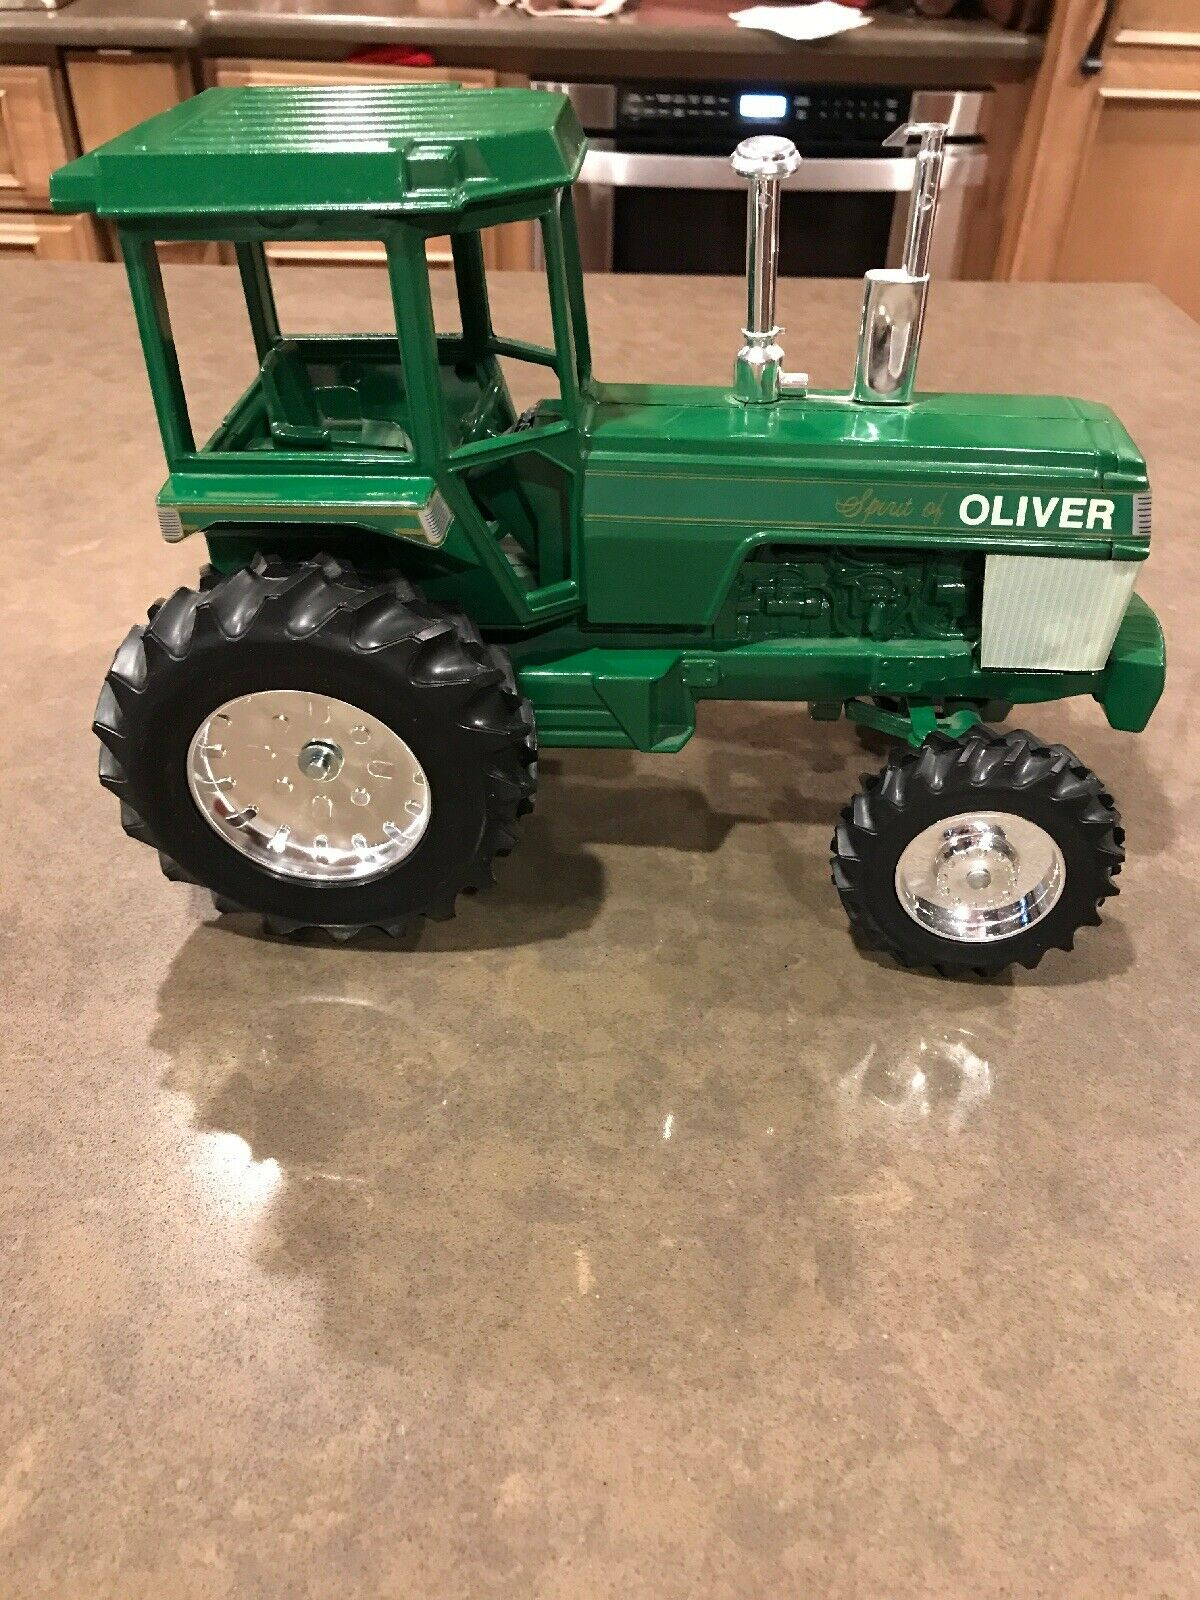 White Spirit Of Oliver 1 16 Tractor